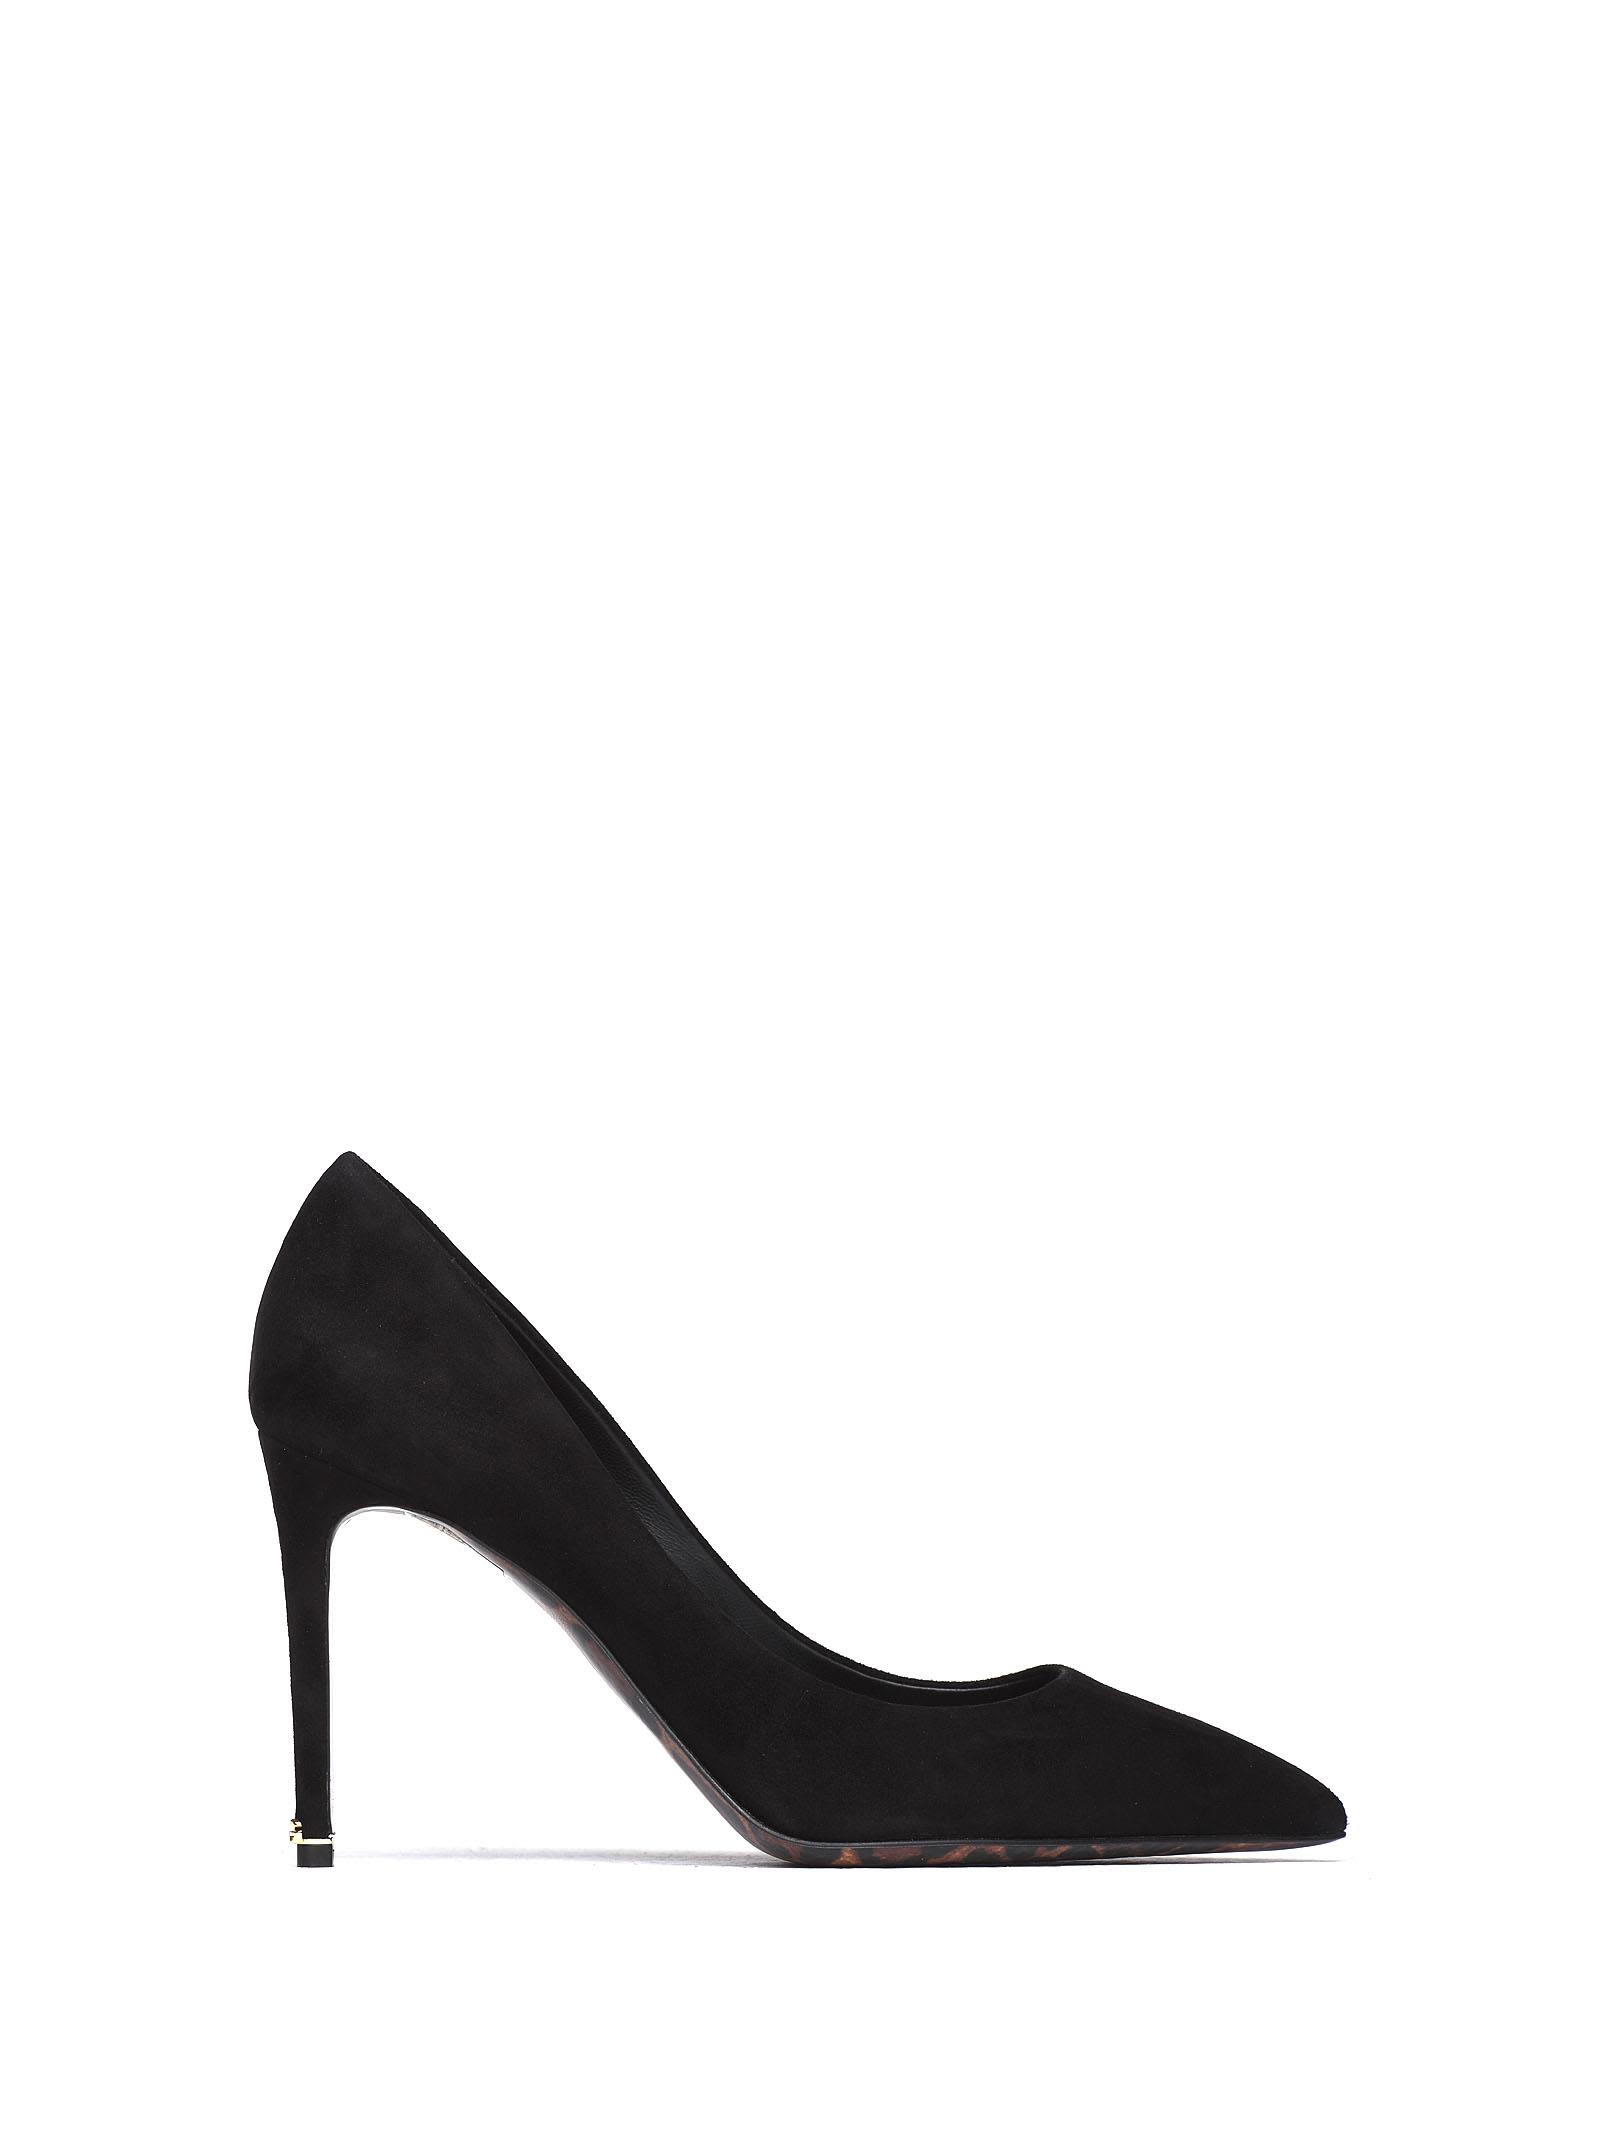 Dolce & Gabbana Pumps Dolce & Gabbana Black Suede Pumps